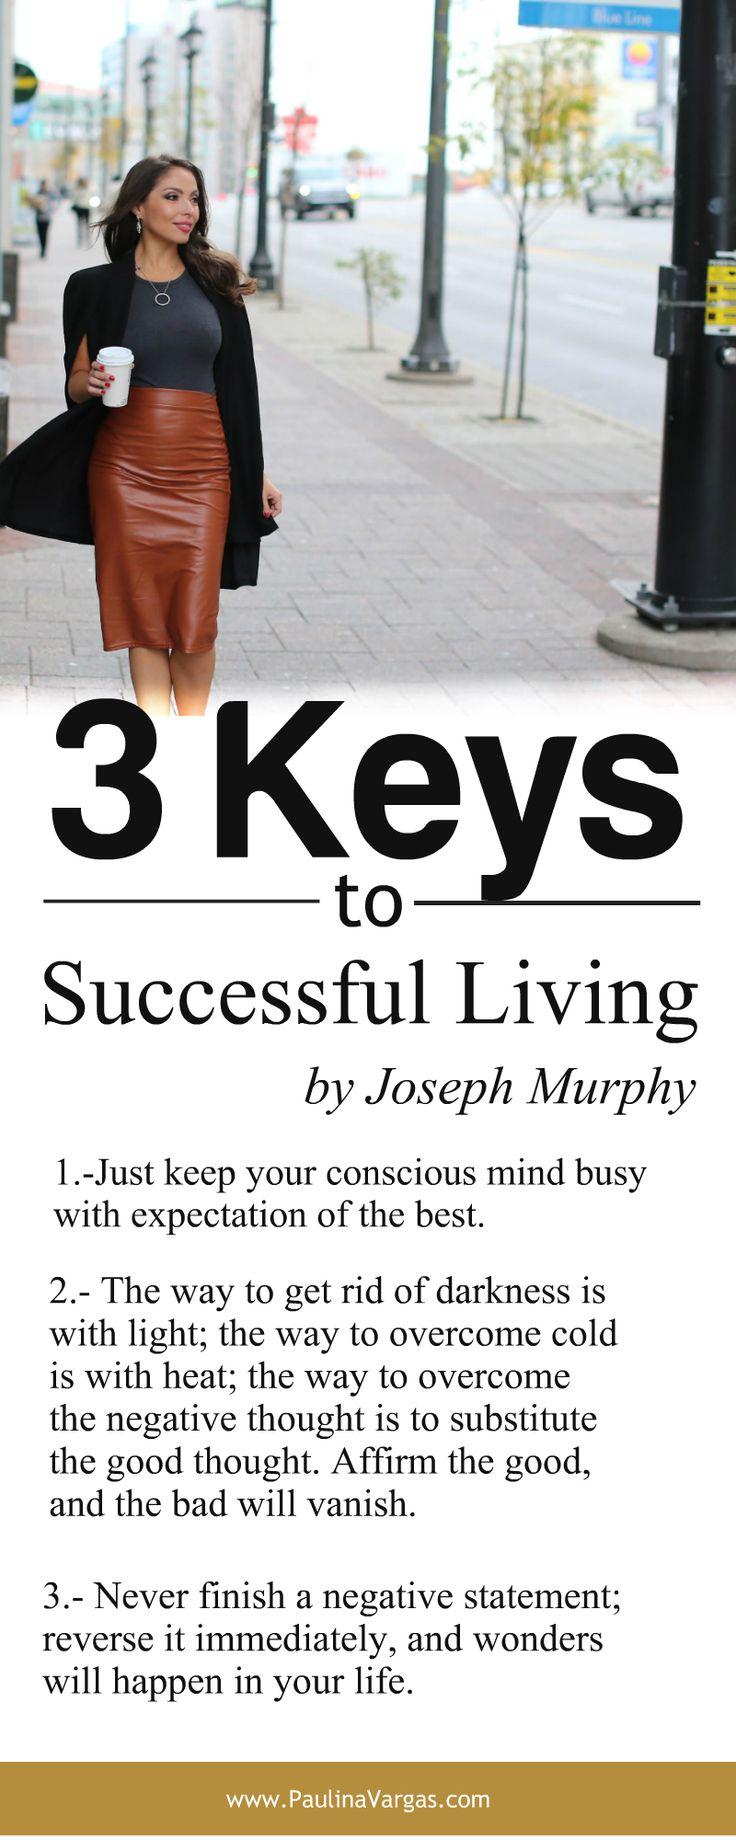 3 Keys to Successful Living... So simple yet so powerful! Wisdom by Joseph Murphy.